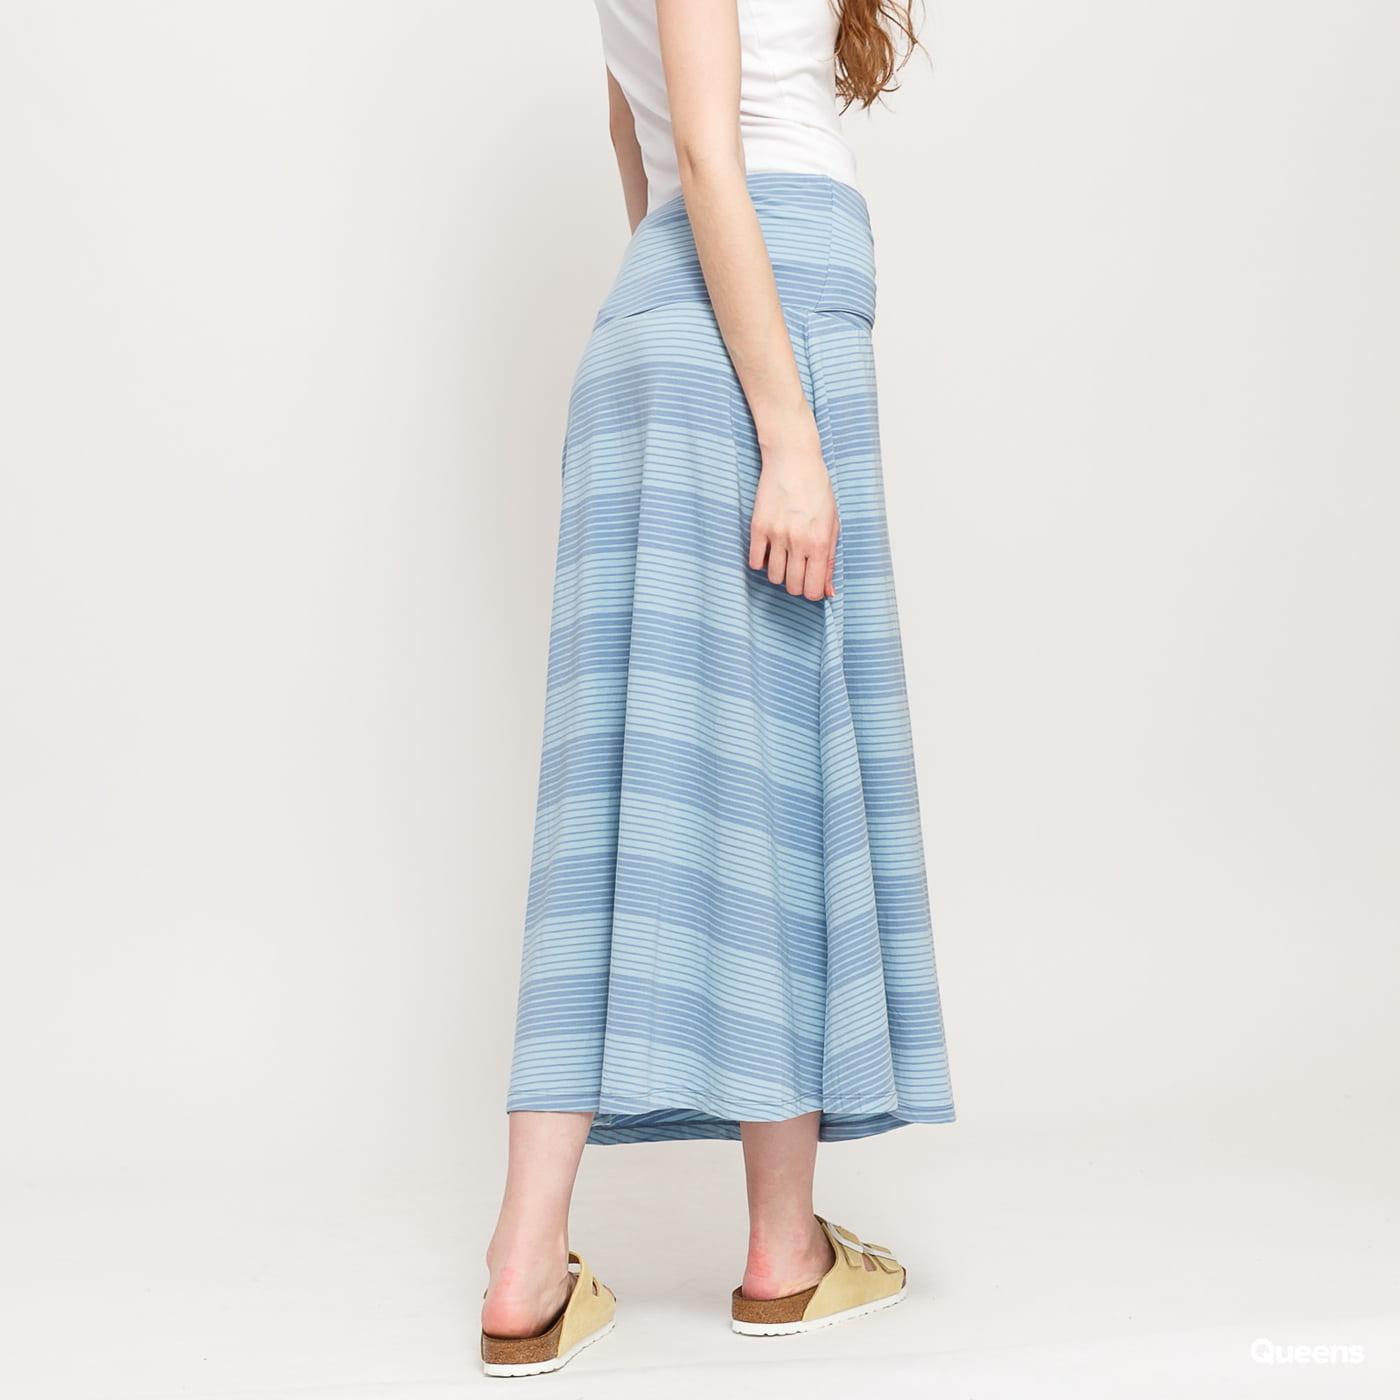 Patagonia W's Kamala Midi Skirt light blue / blue